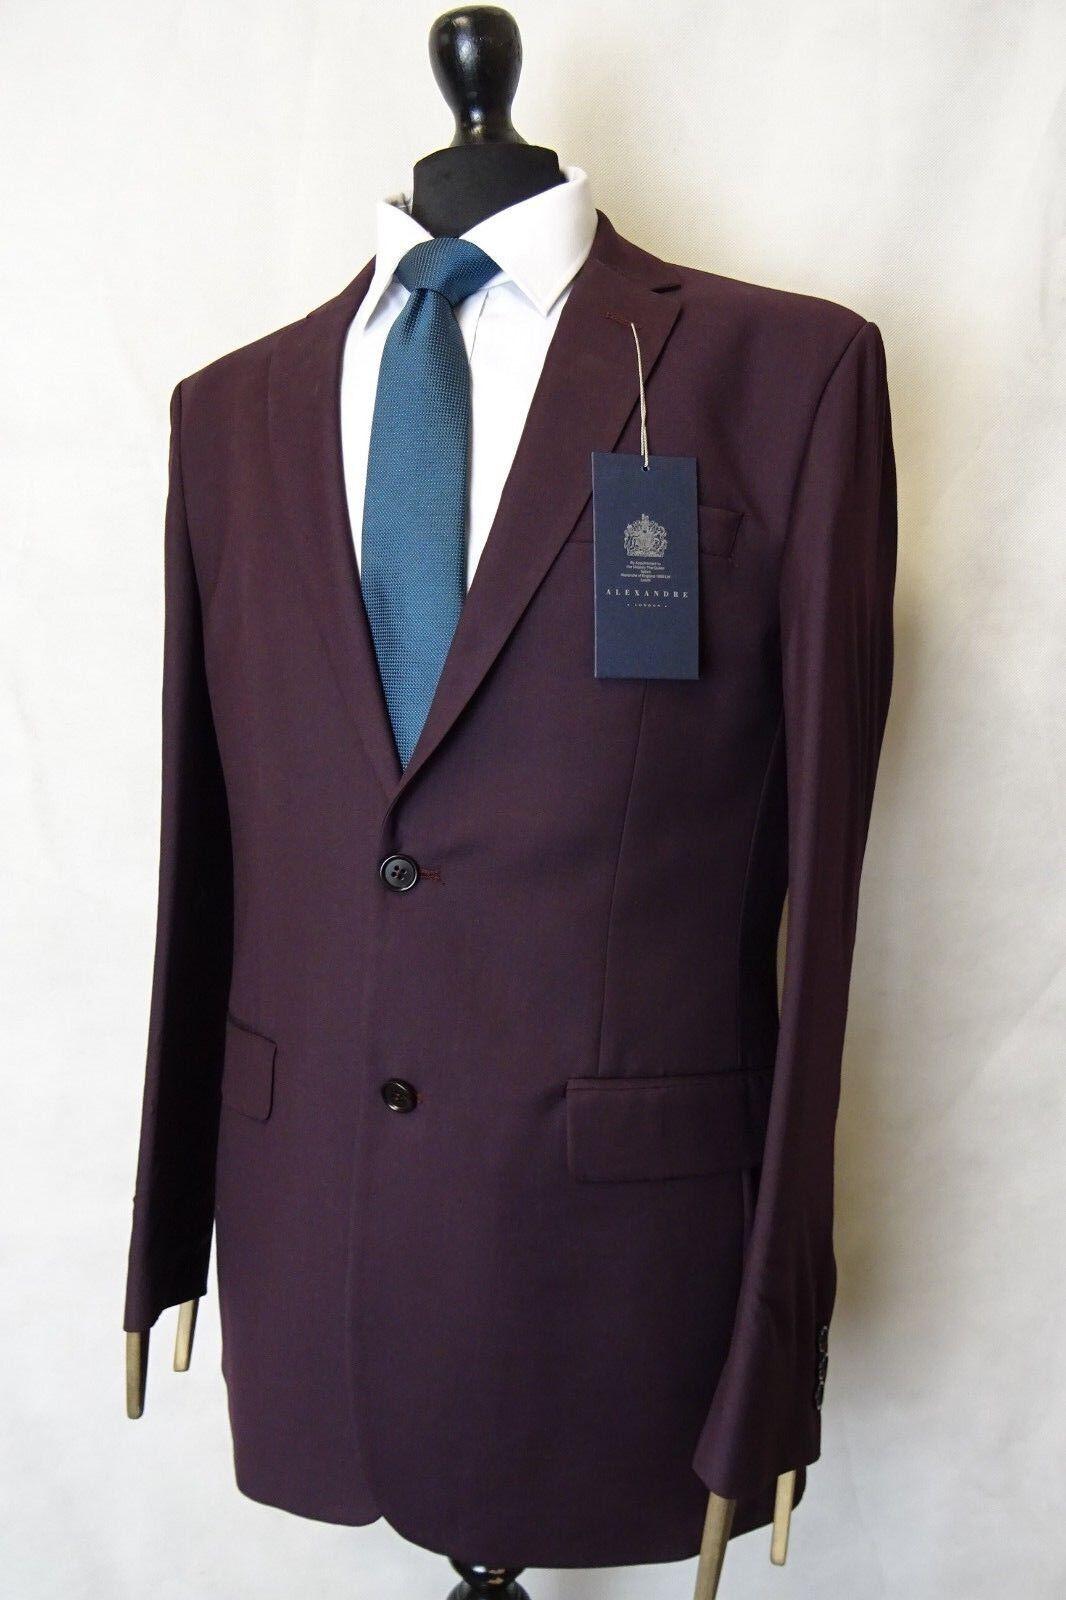 Men's New Alexandre London Burgundy Tailored Fit Suit 40R W32 L31 AA2935